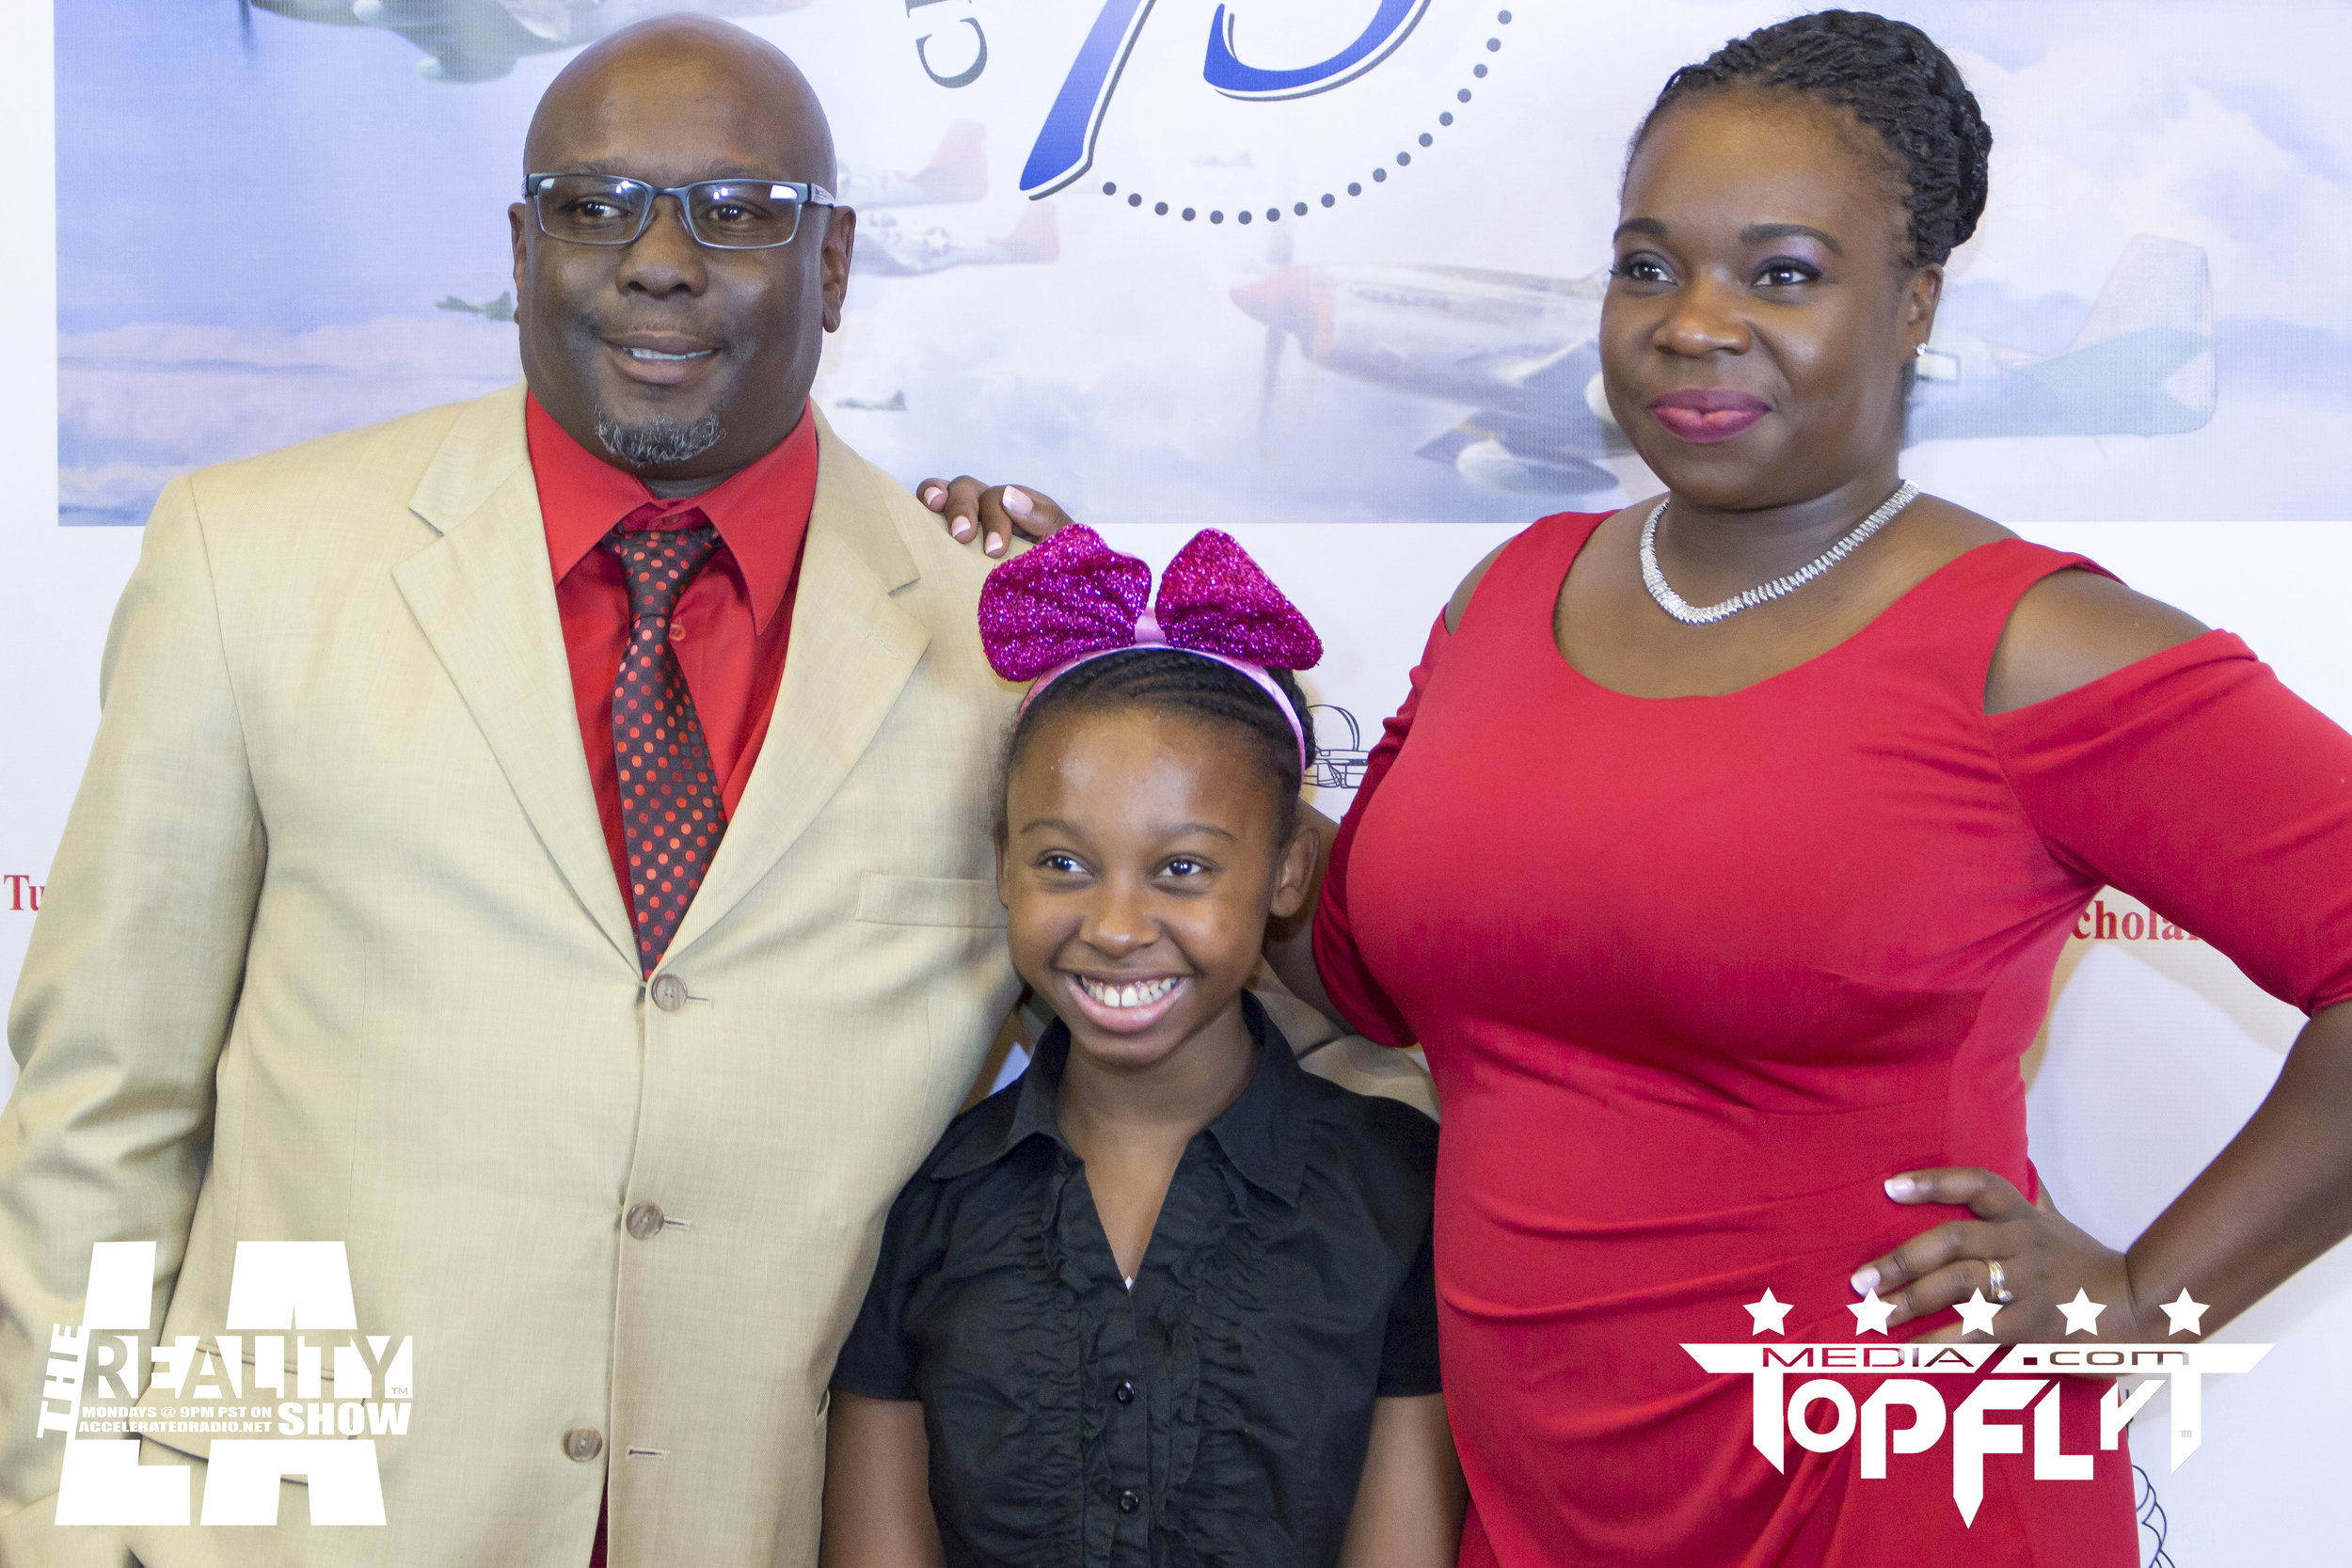 The Reality Show LA - Tuskegee Airmen 75th Anniversary VIP Reception_101.jpg